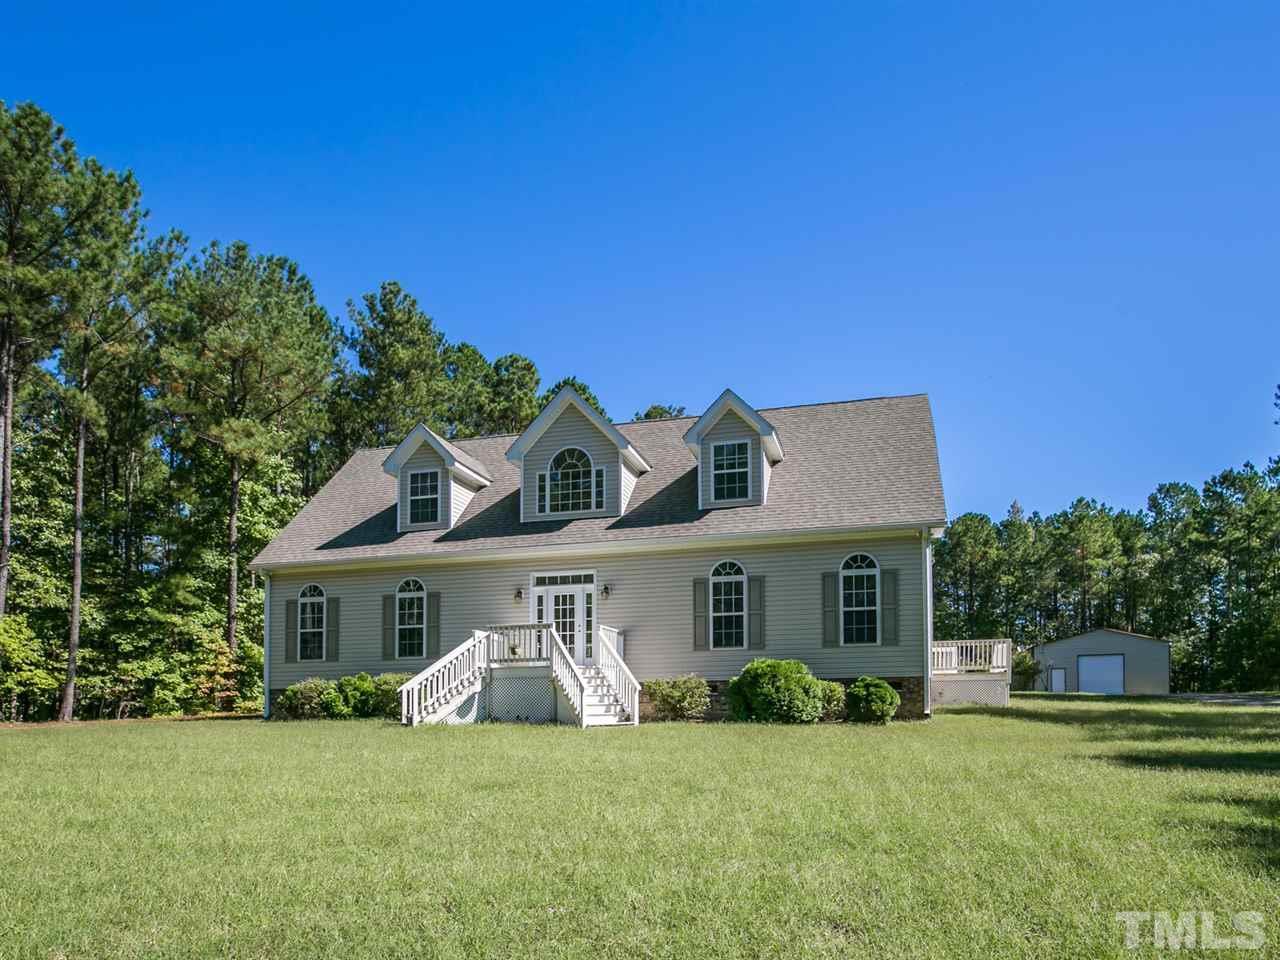 1618 Country Ln, Creedmoor, NC